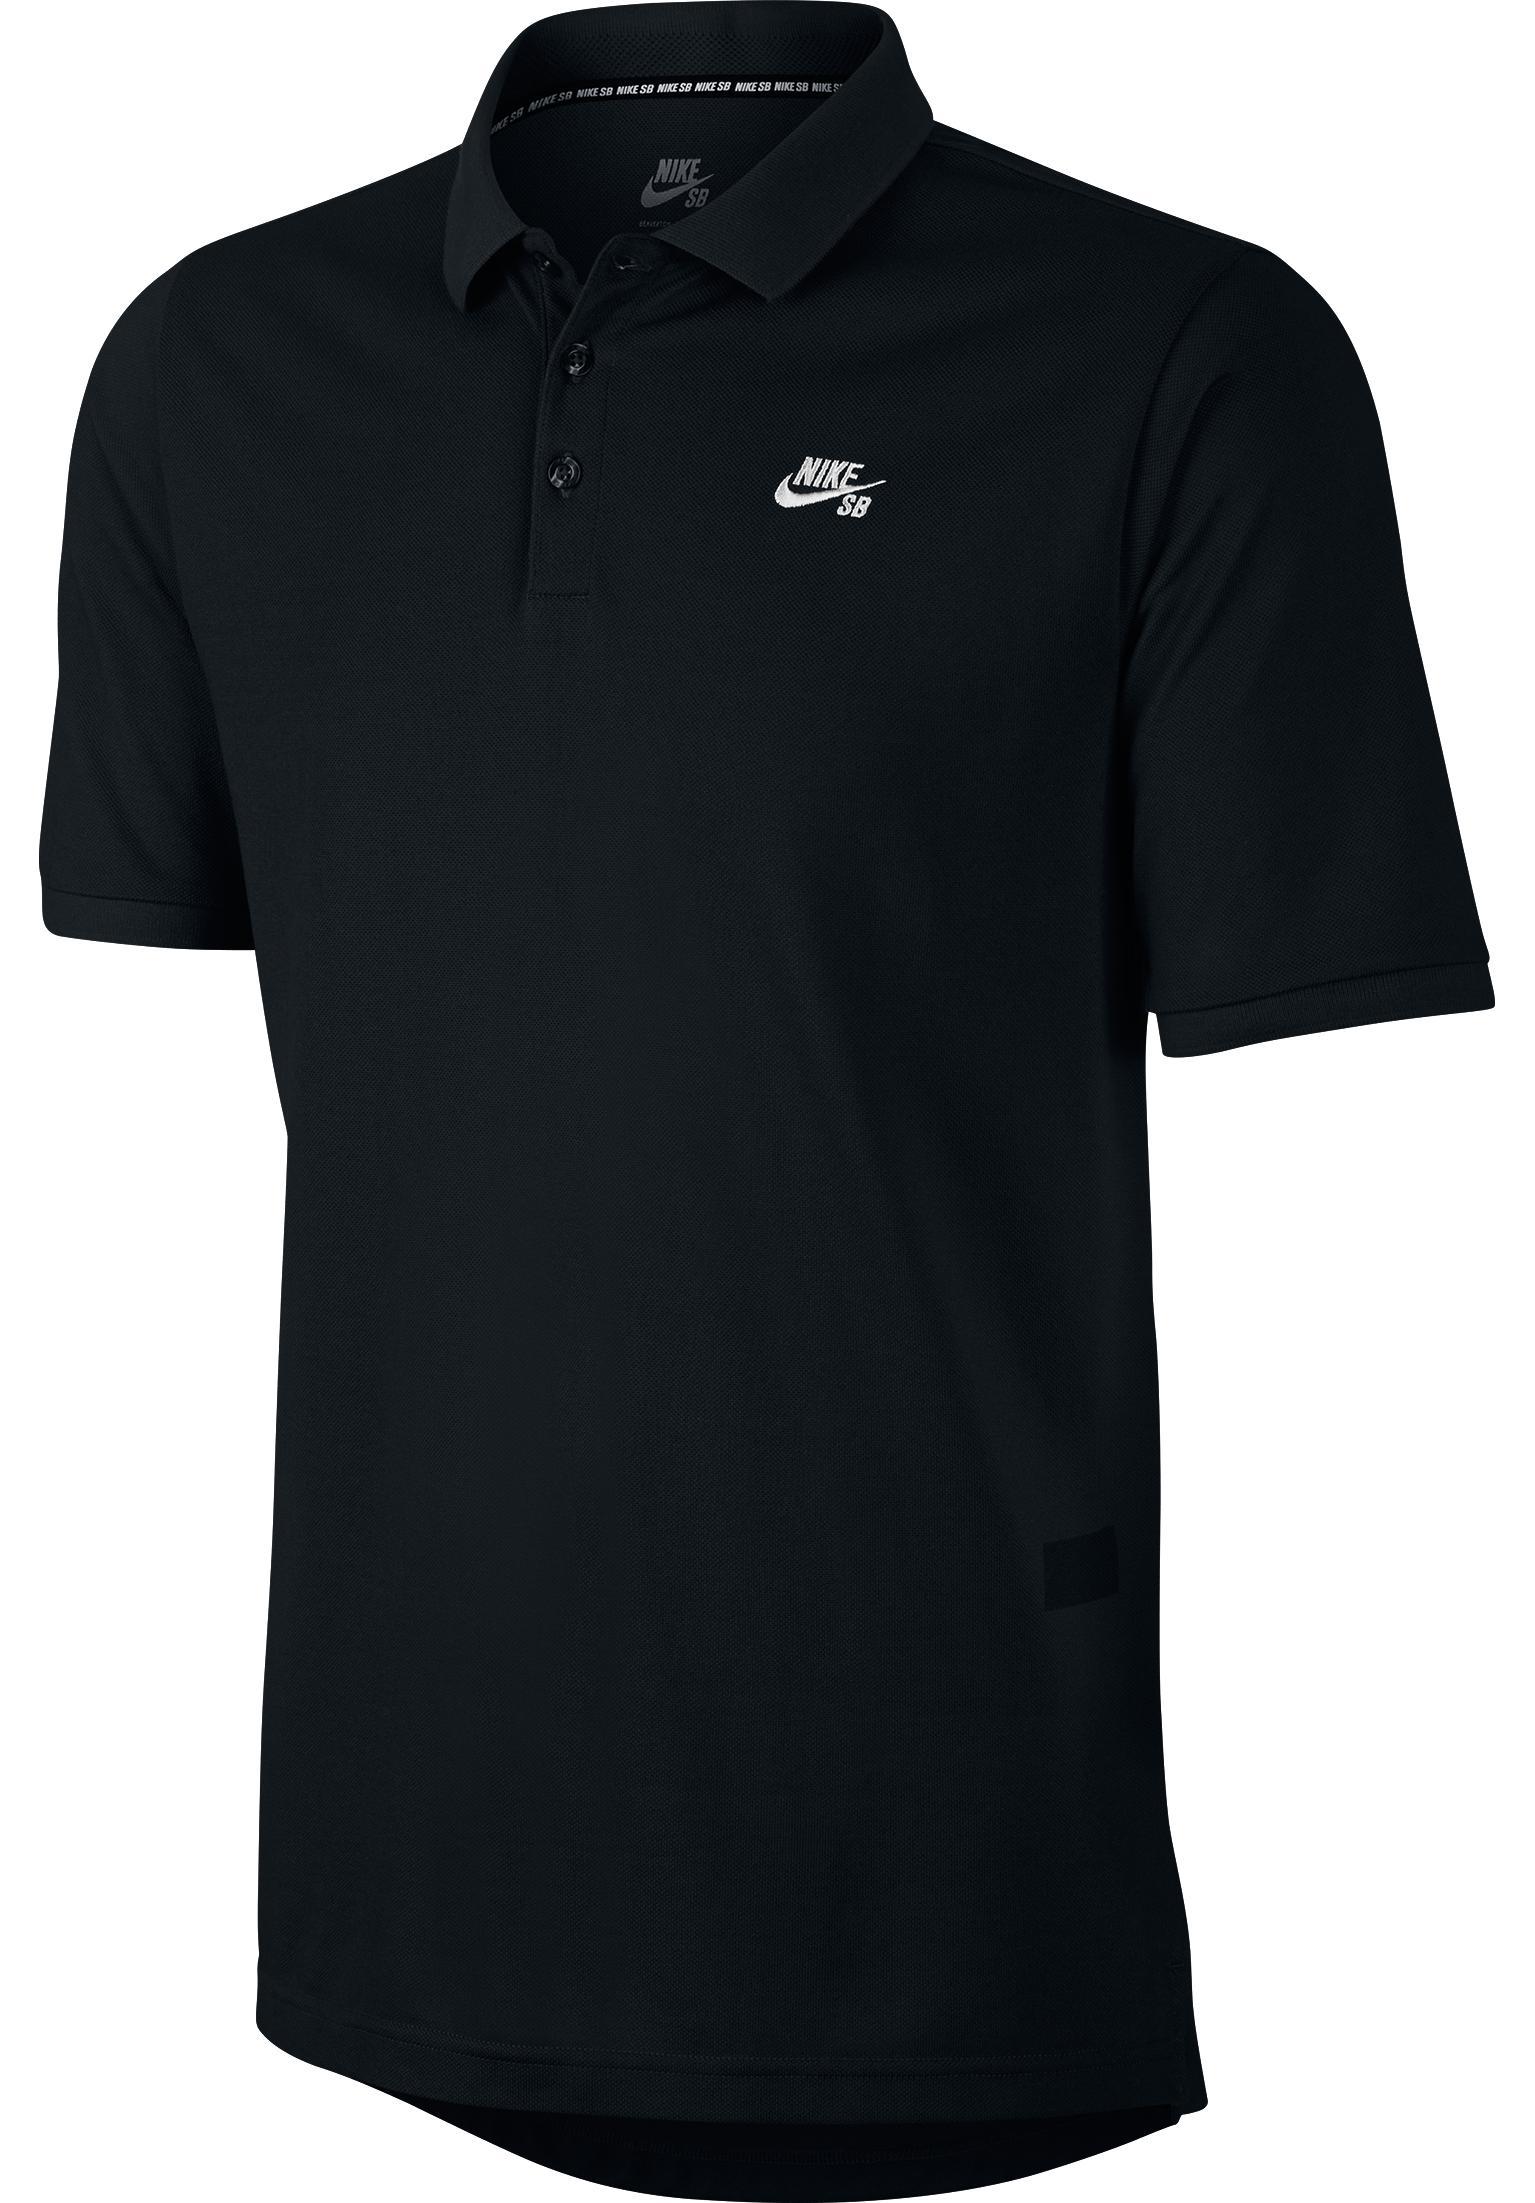 DFT Pique Nike SB Polo Shirts in black-white for Men  abb5e98f72d5d